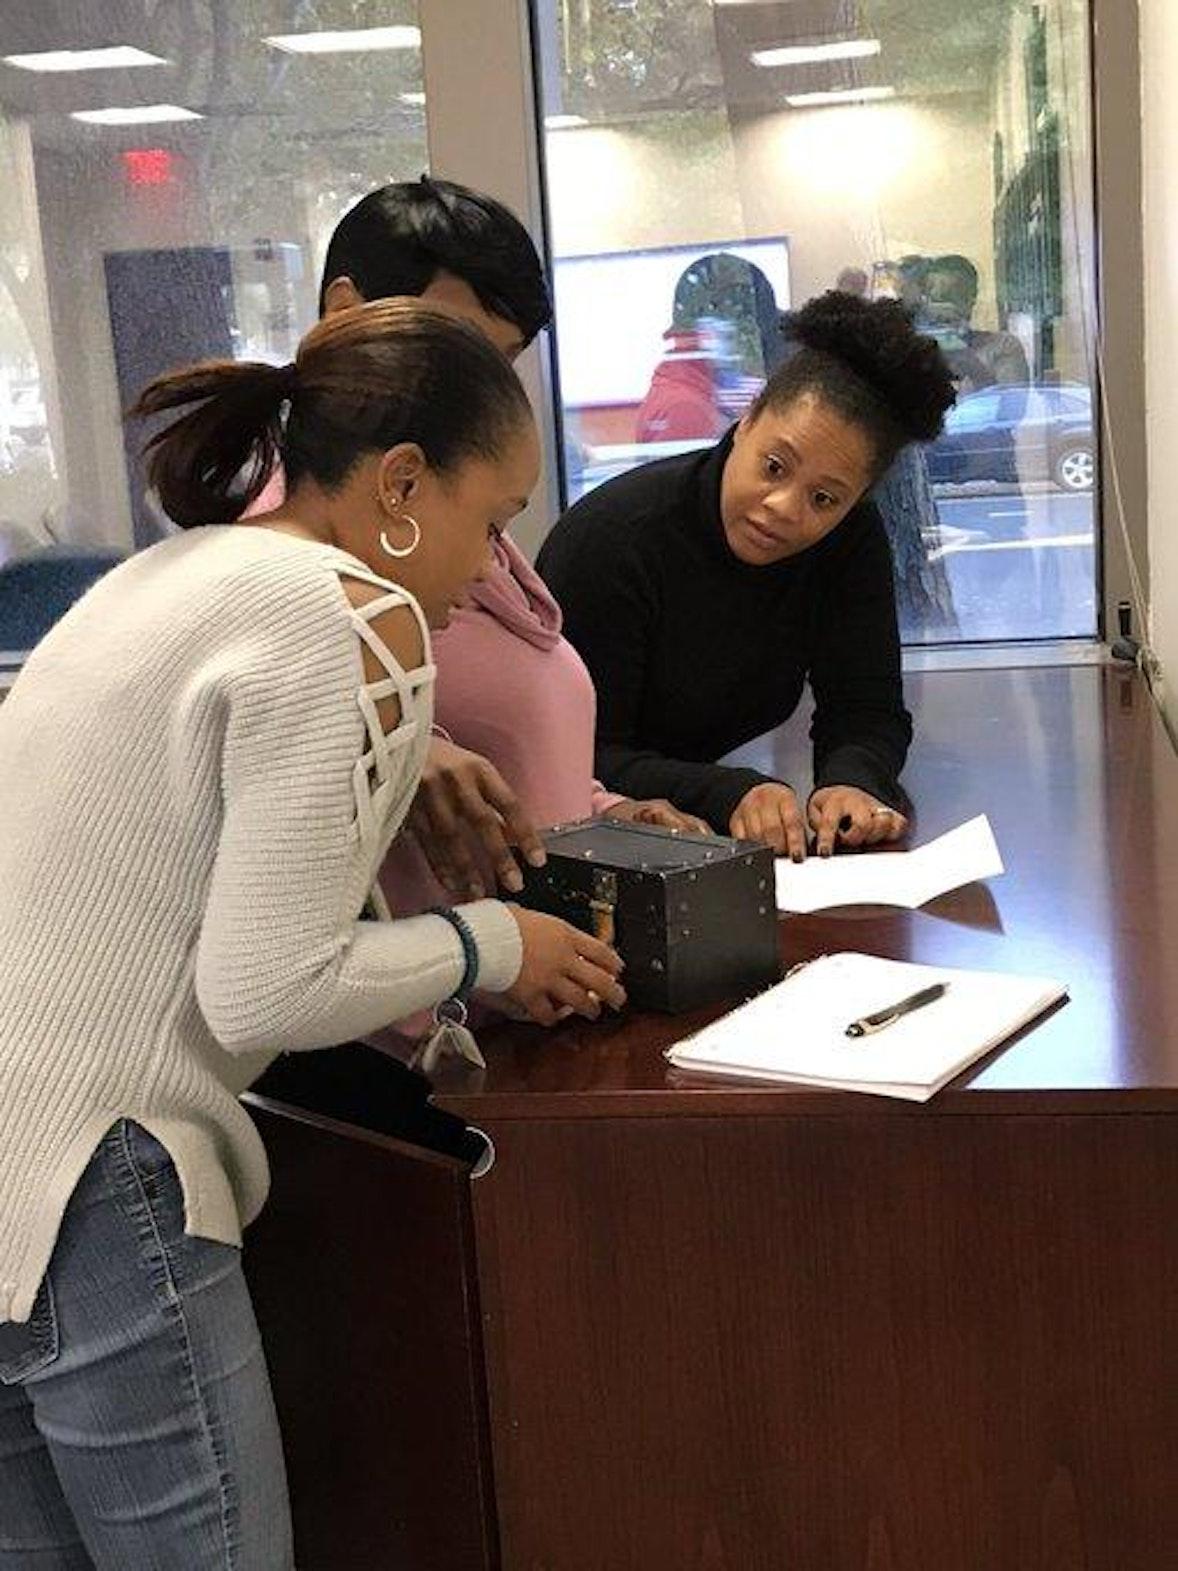 Three women work on opening a box